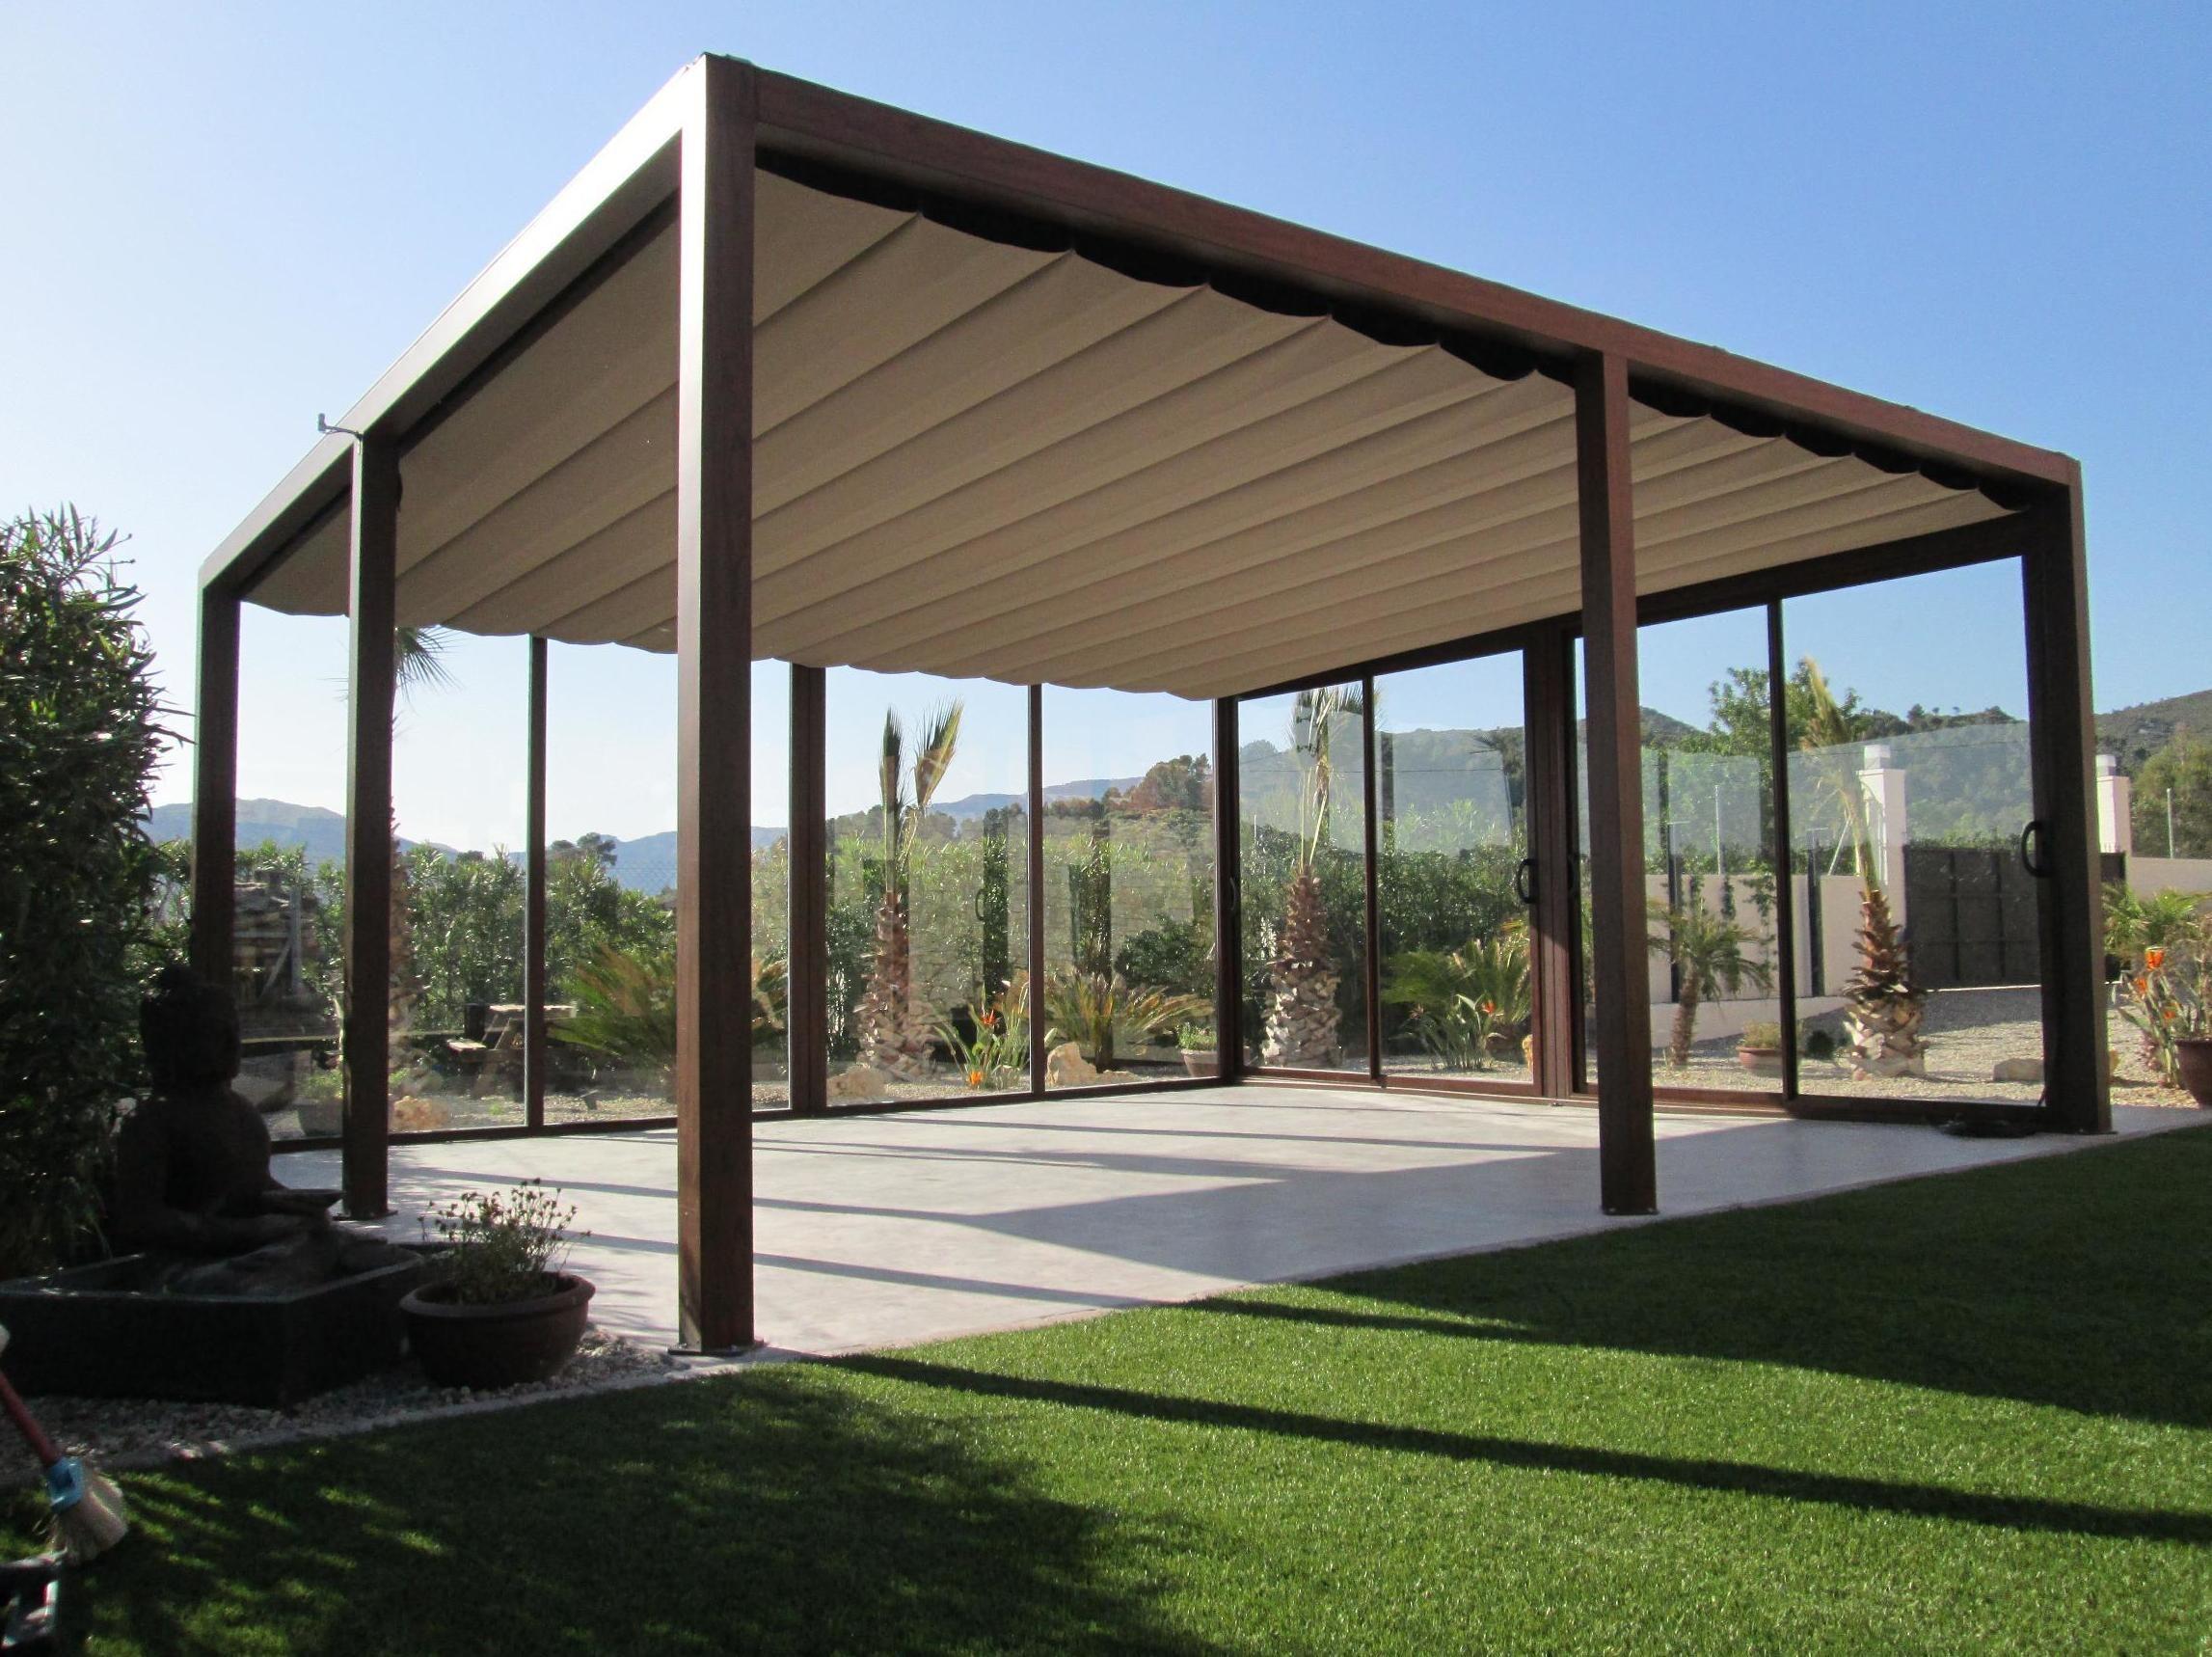 Pergolas en aluminio prgolas de aluminio lona corredera for Estructuras de jardin